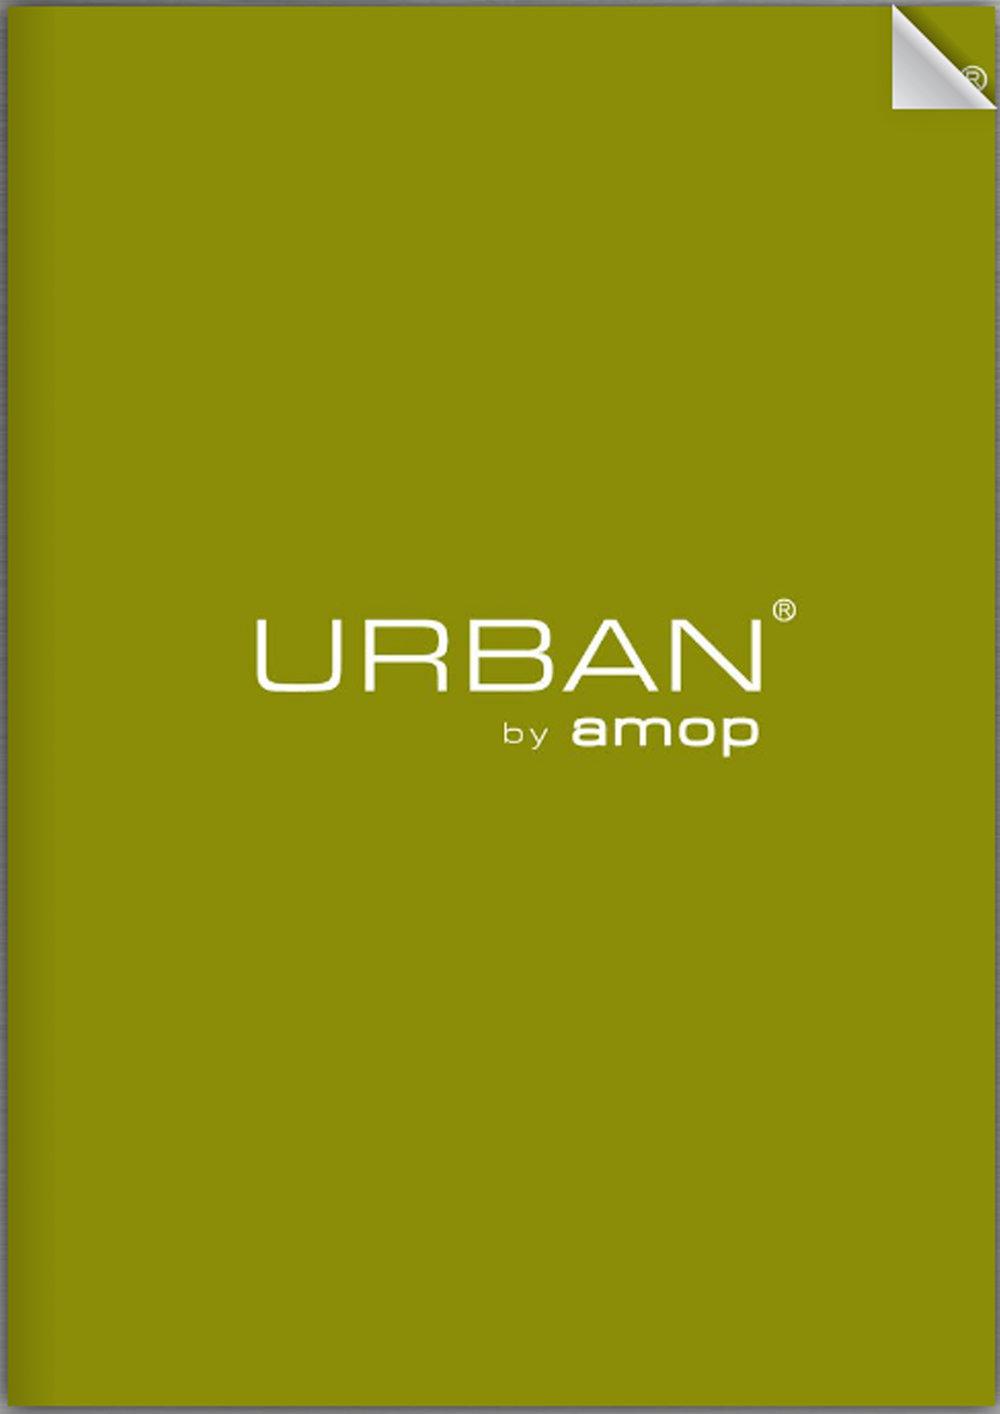 Amop Urban from Omos